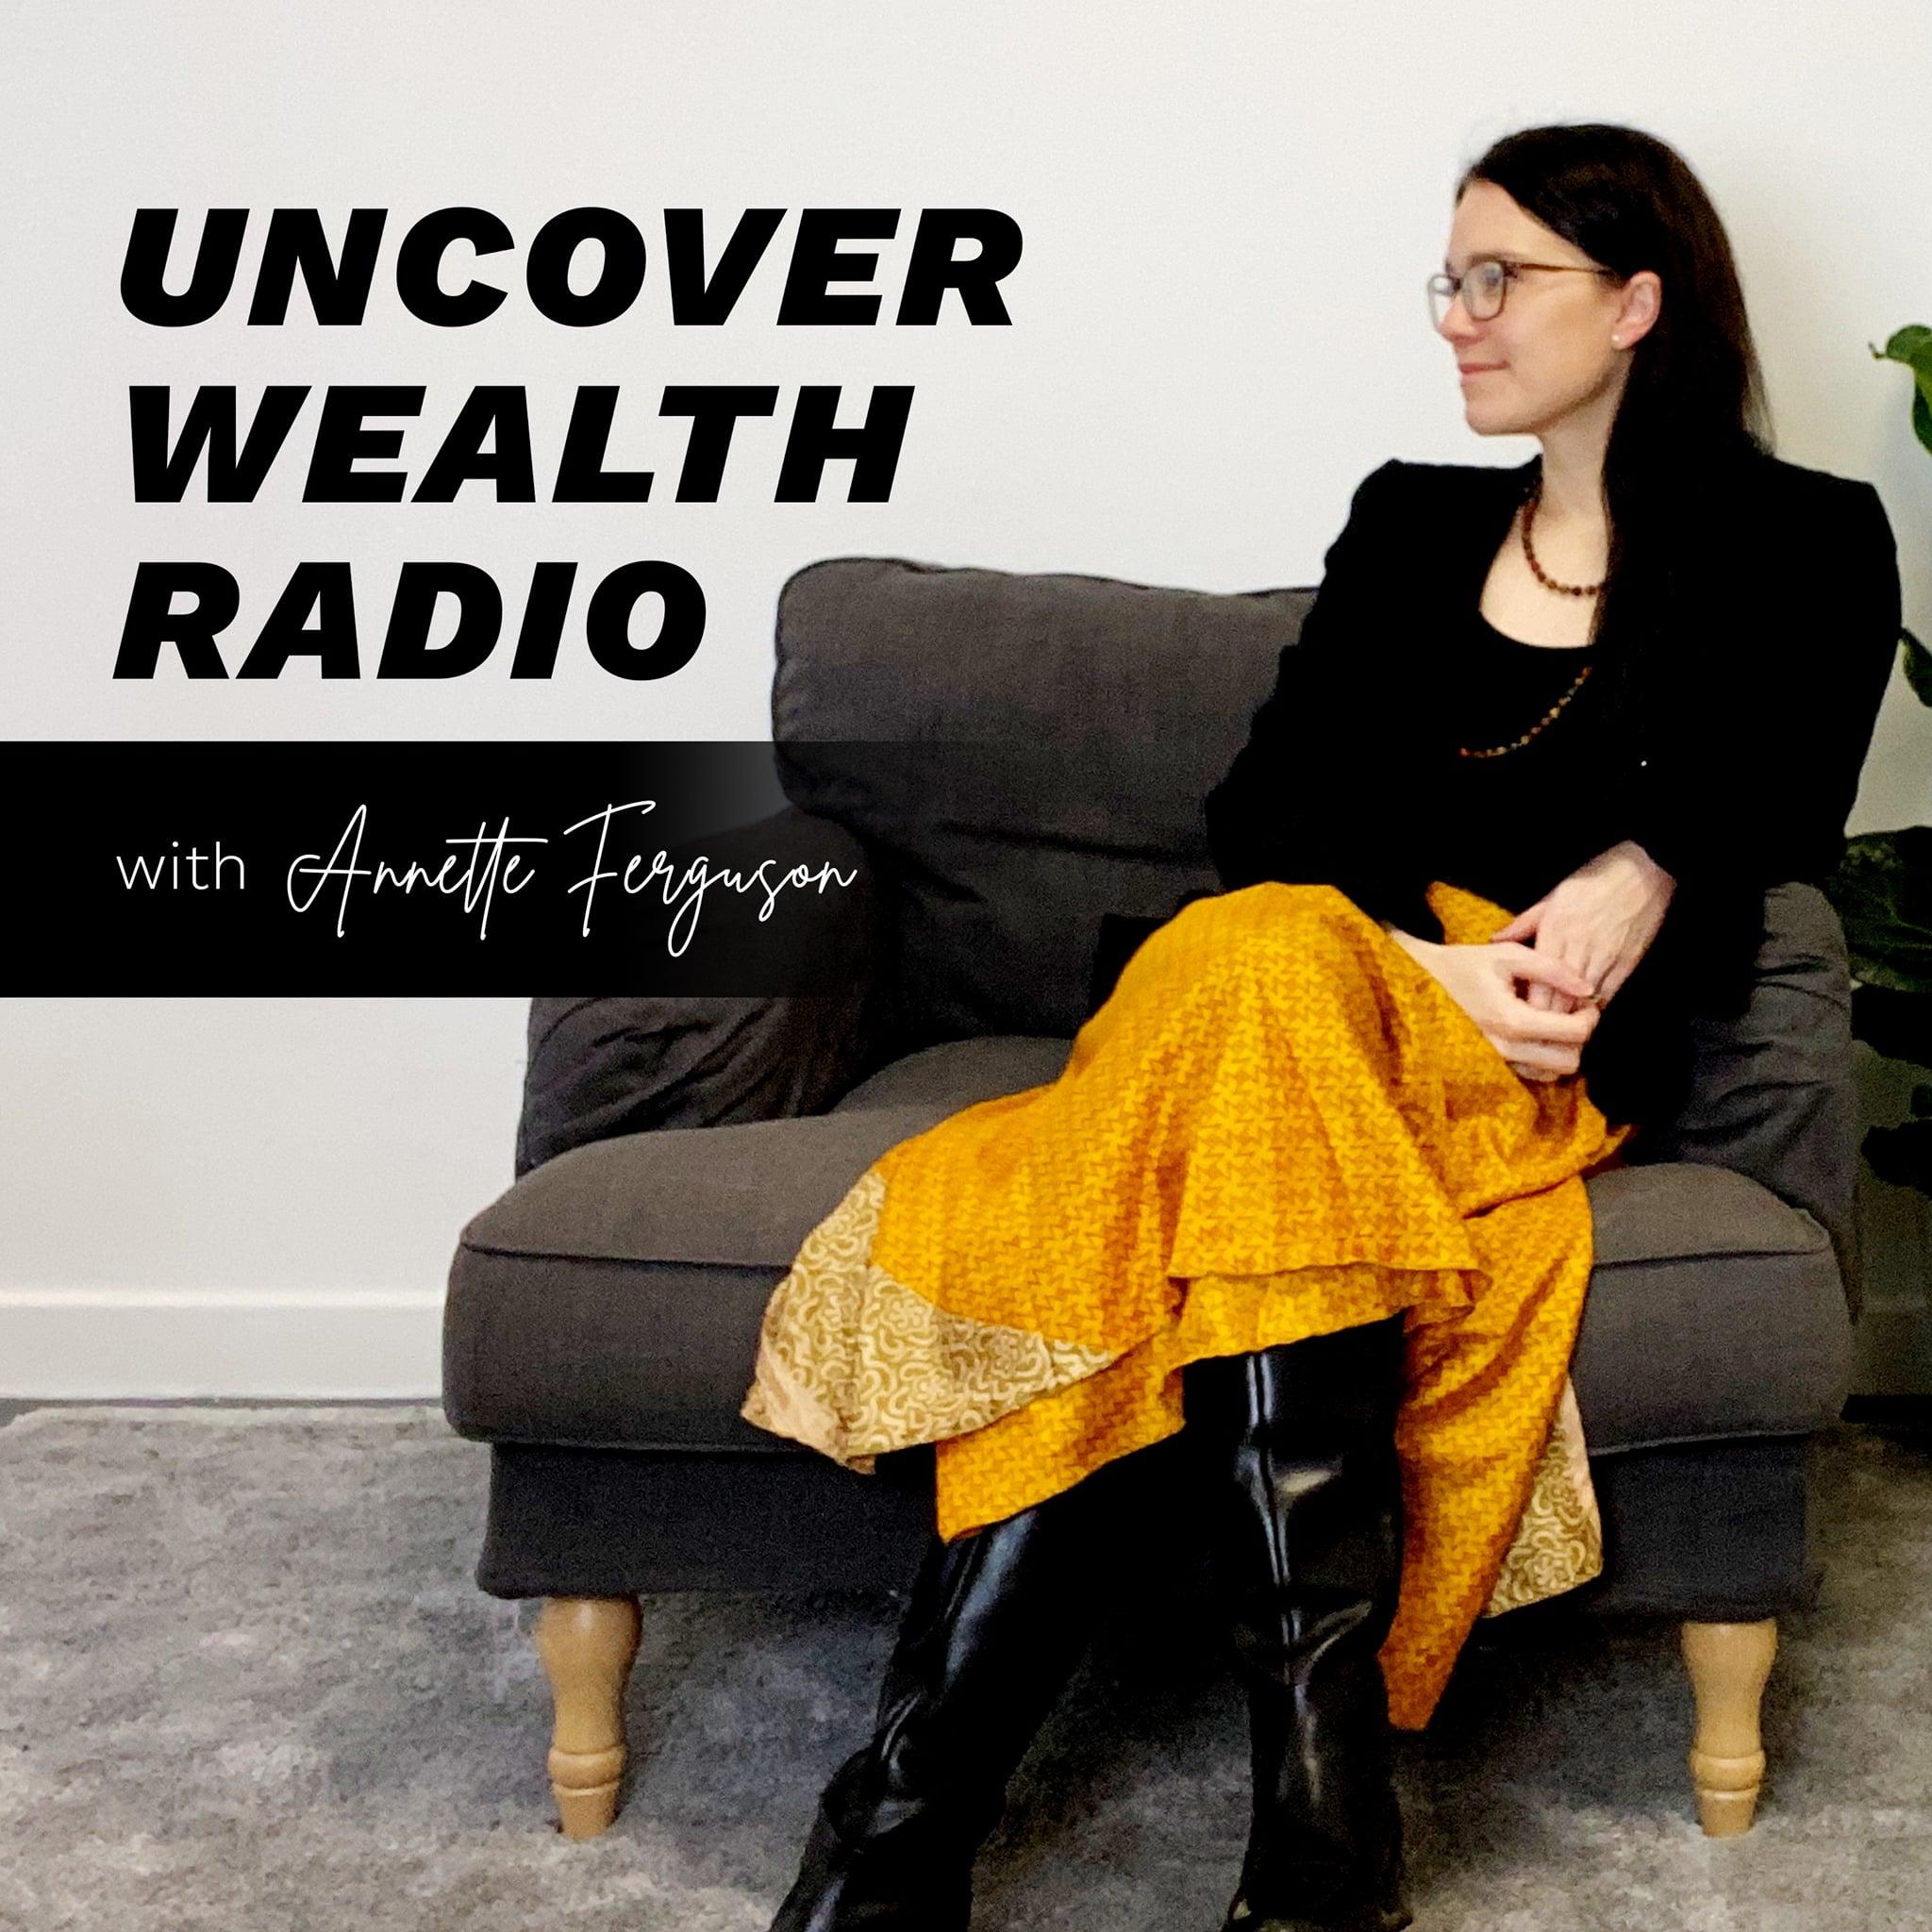 Uncover Wealth Radio Podcast Art